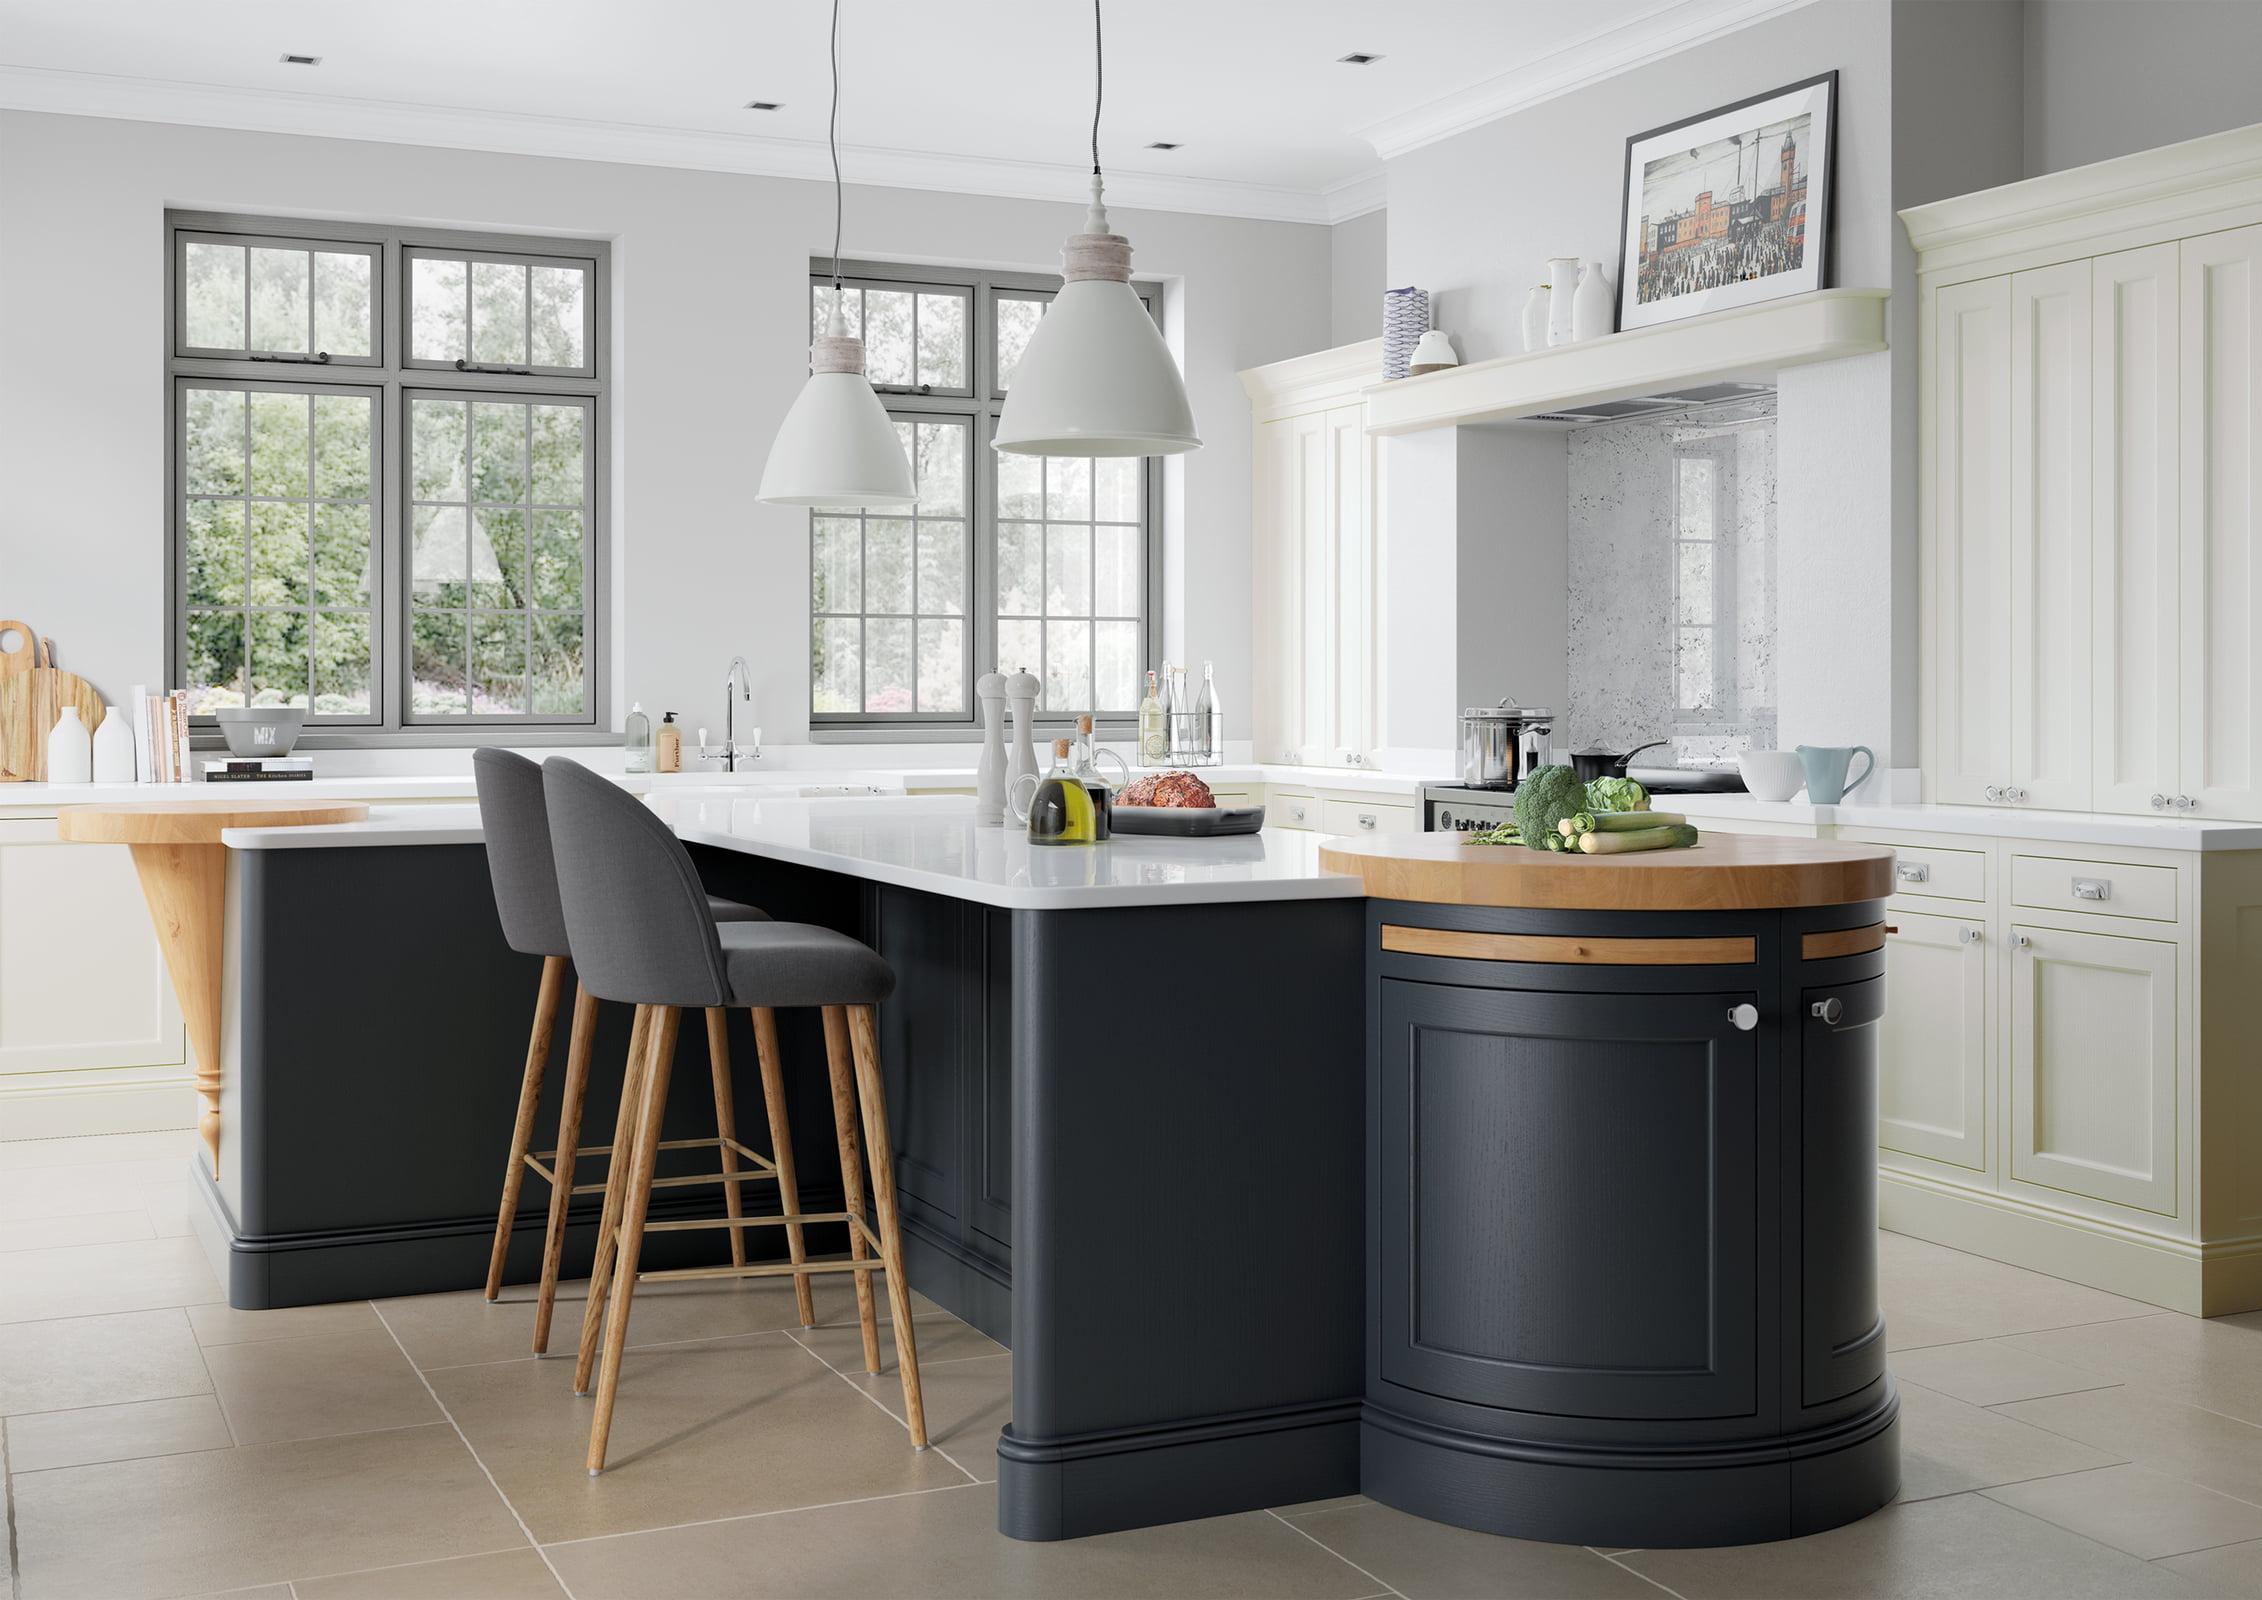 Belgravia Porcelain Kitchen Design | Oxted Kitchens